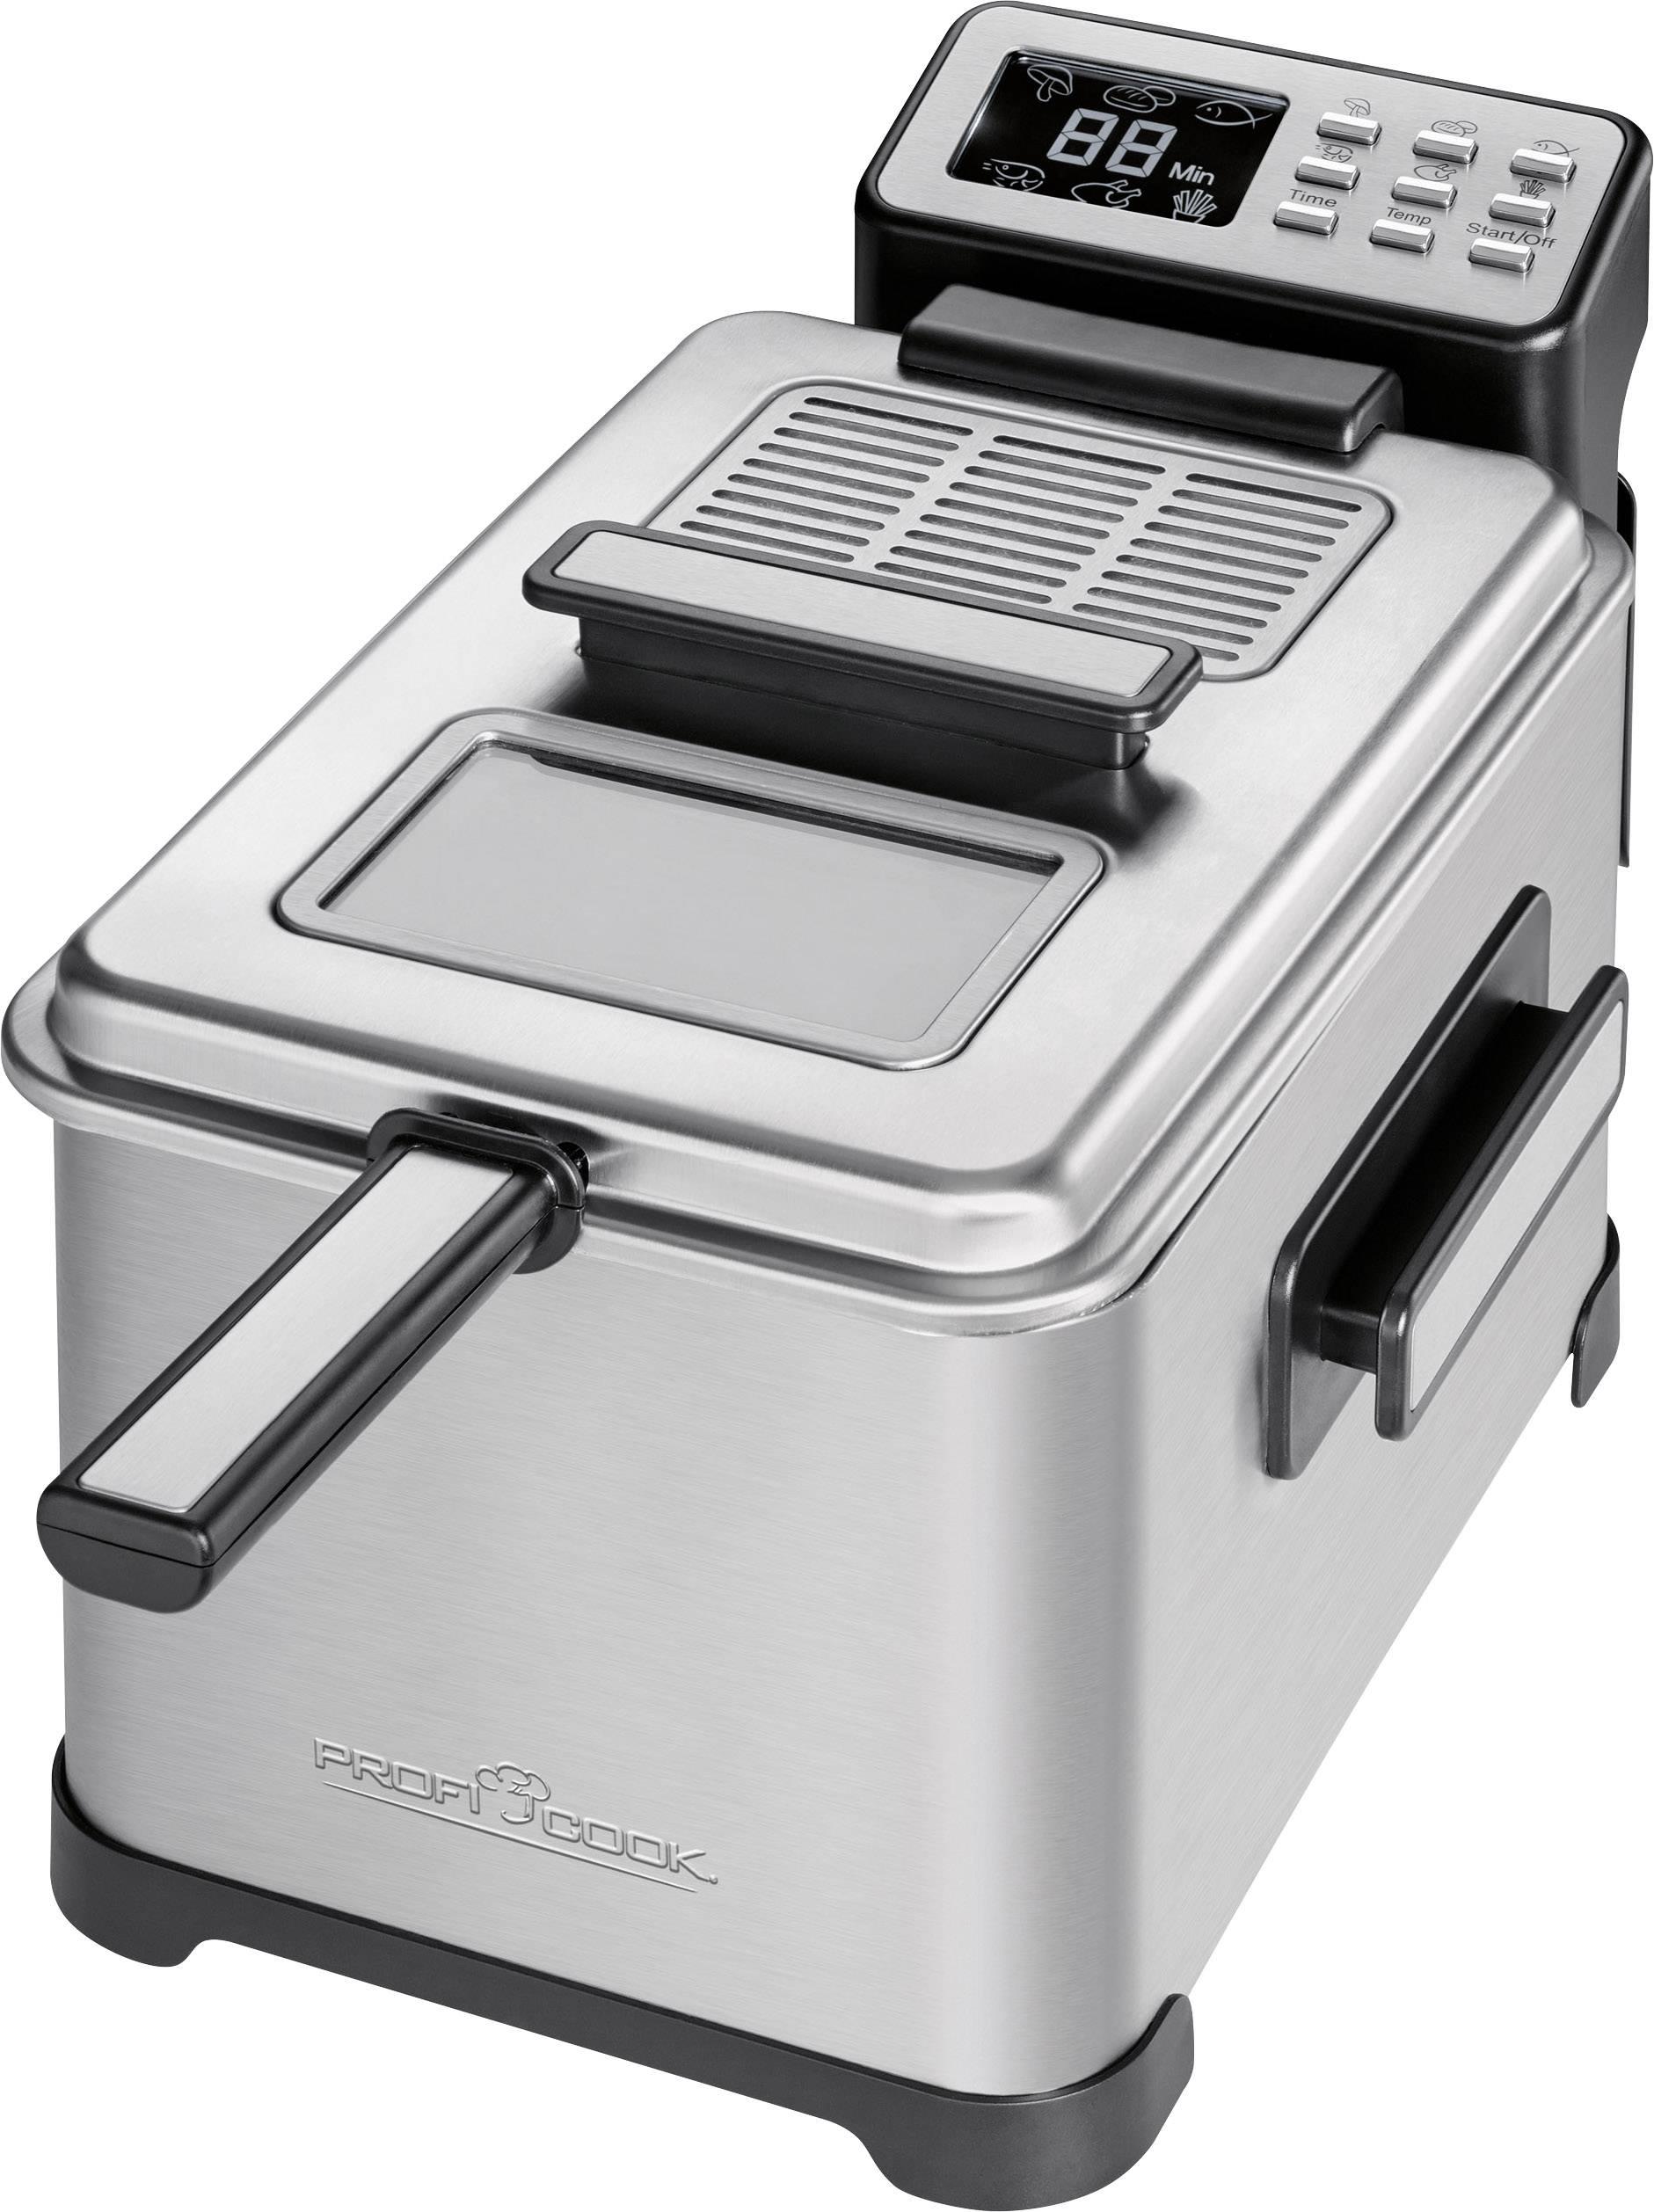 Fritteuse 2500 W Mit Display Profi Cook PC FR 10 Edelstahl, Schwarz